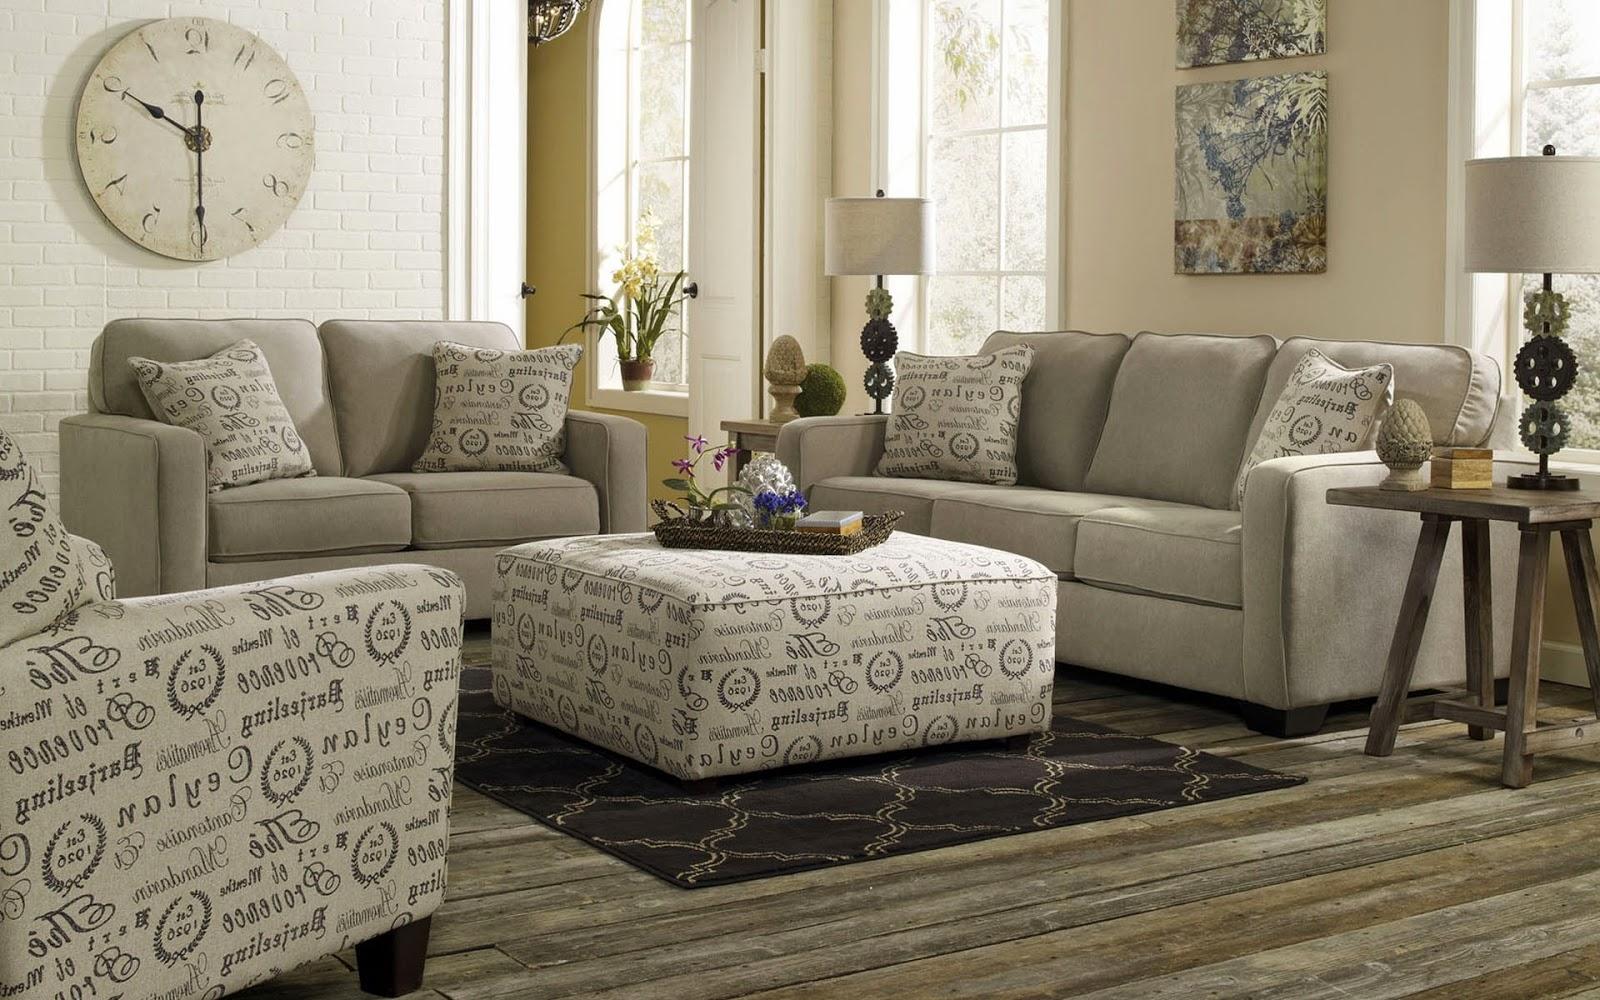 broyhill sofa nebraska furniture mart apartment length small house interior design best 5 sofas by ashley tips decoration home